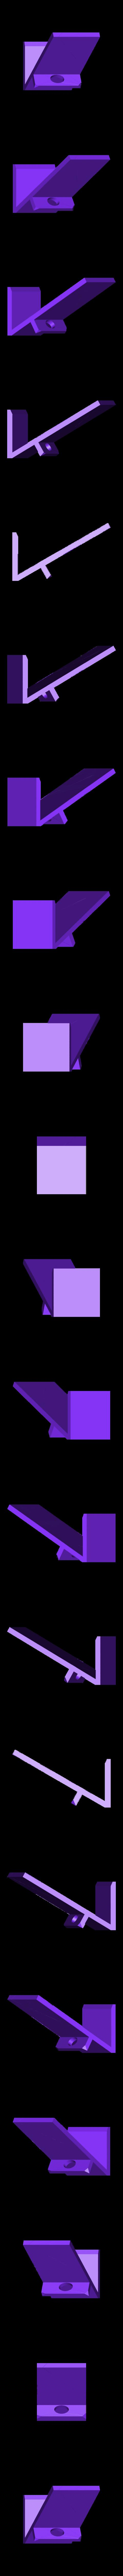 Nouvelle scène.stl Download STL file universal smartphone support • 3D print object, inventeur